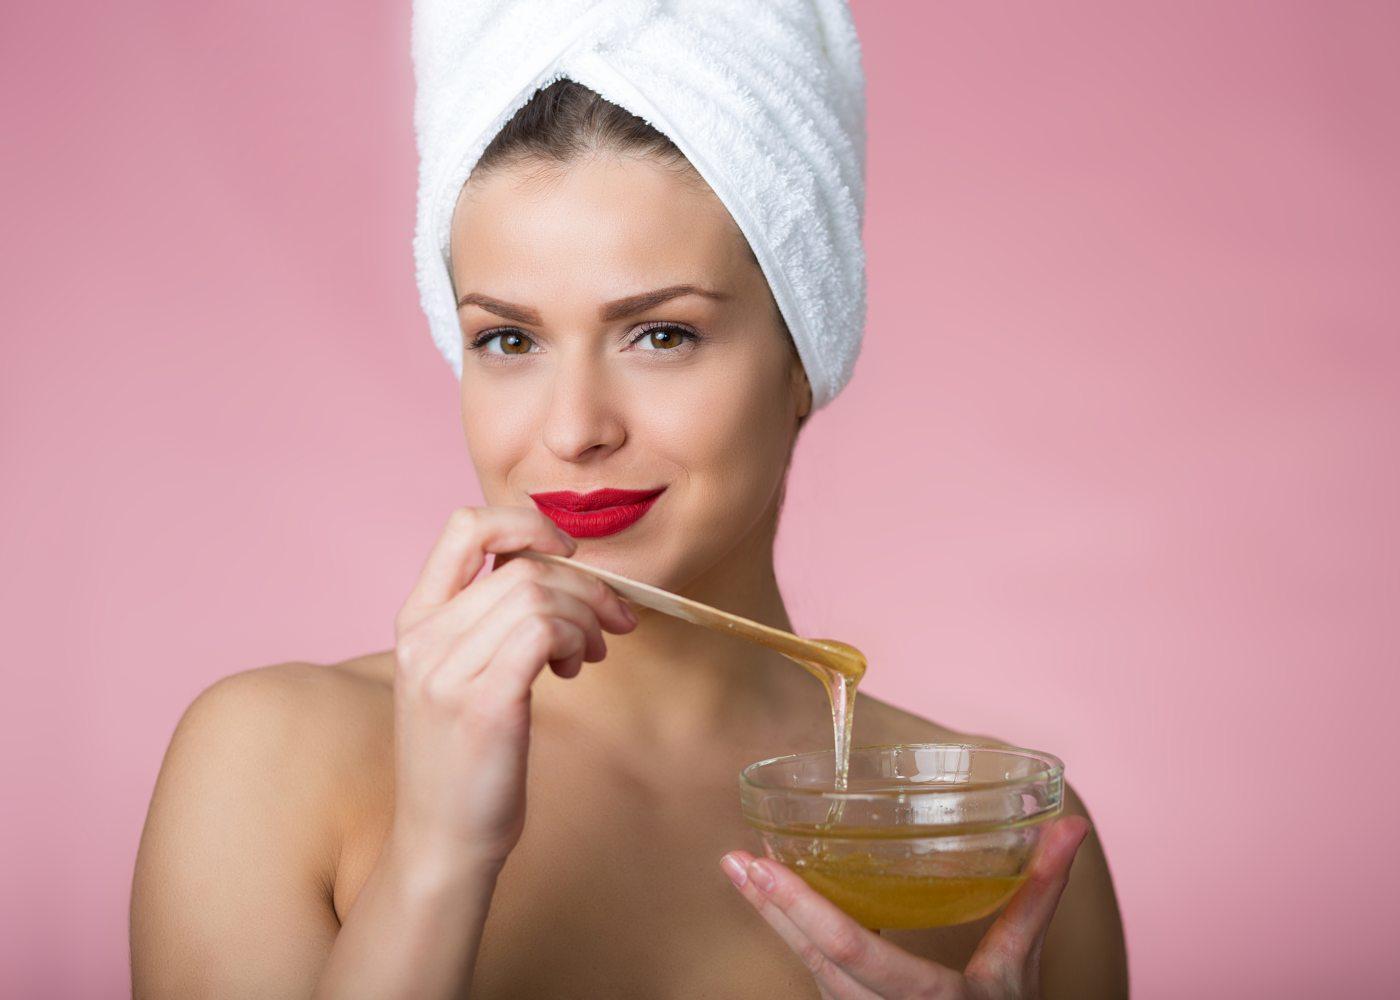 Mulher a experimentar máscaras com mel